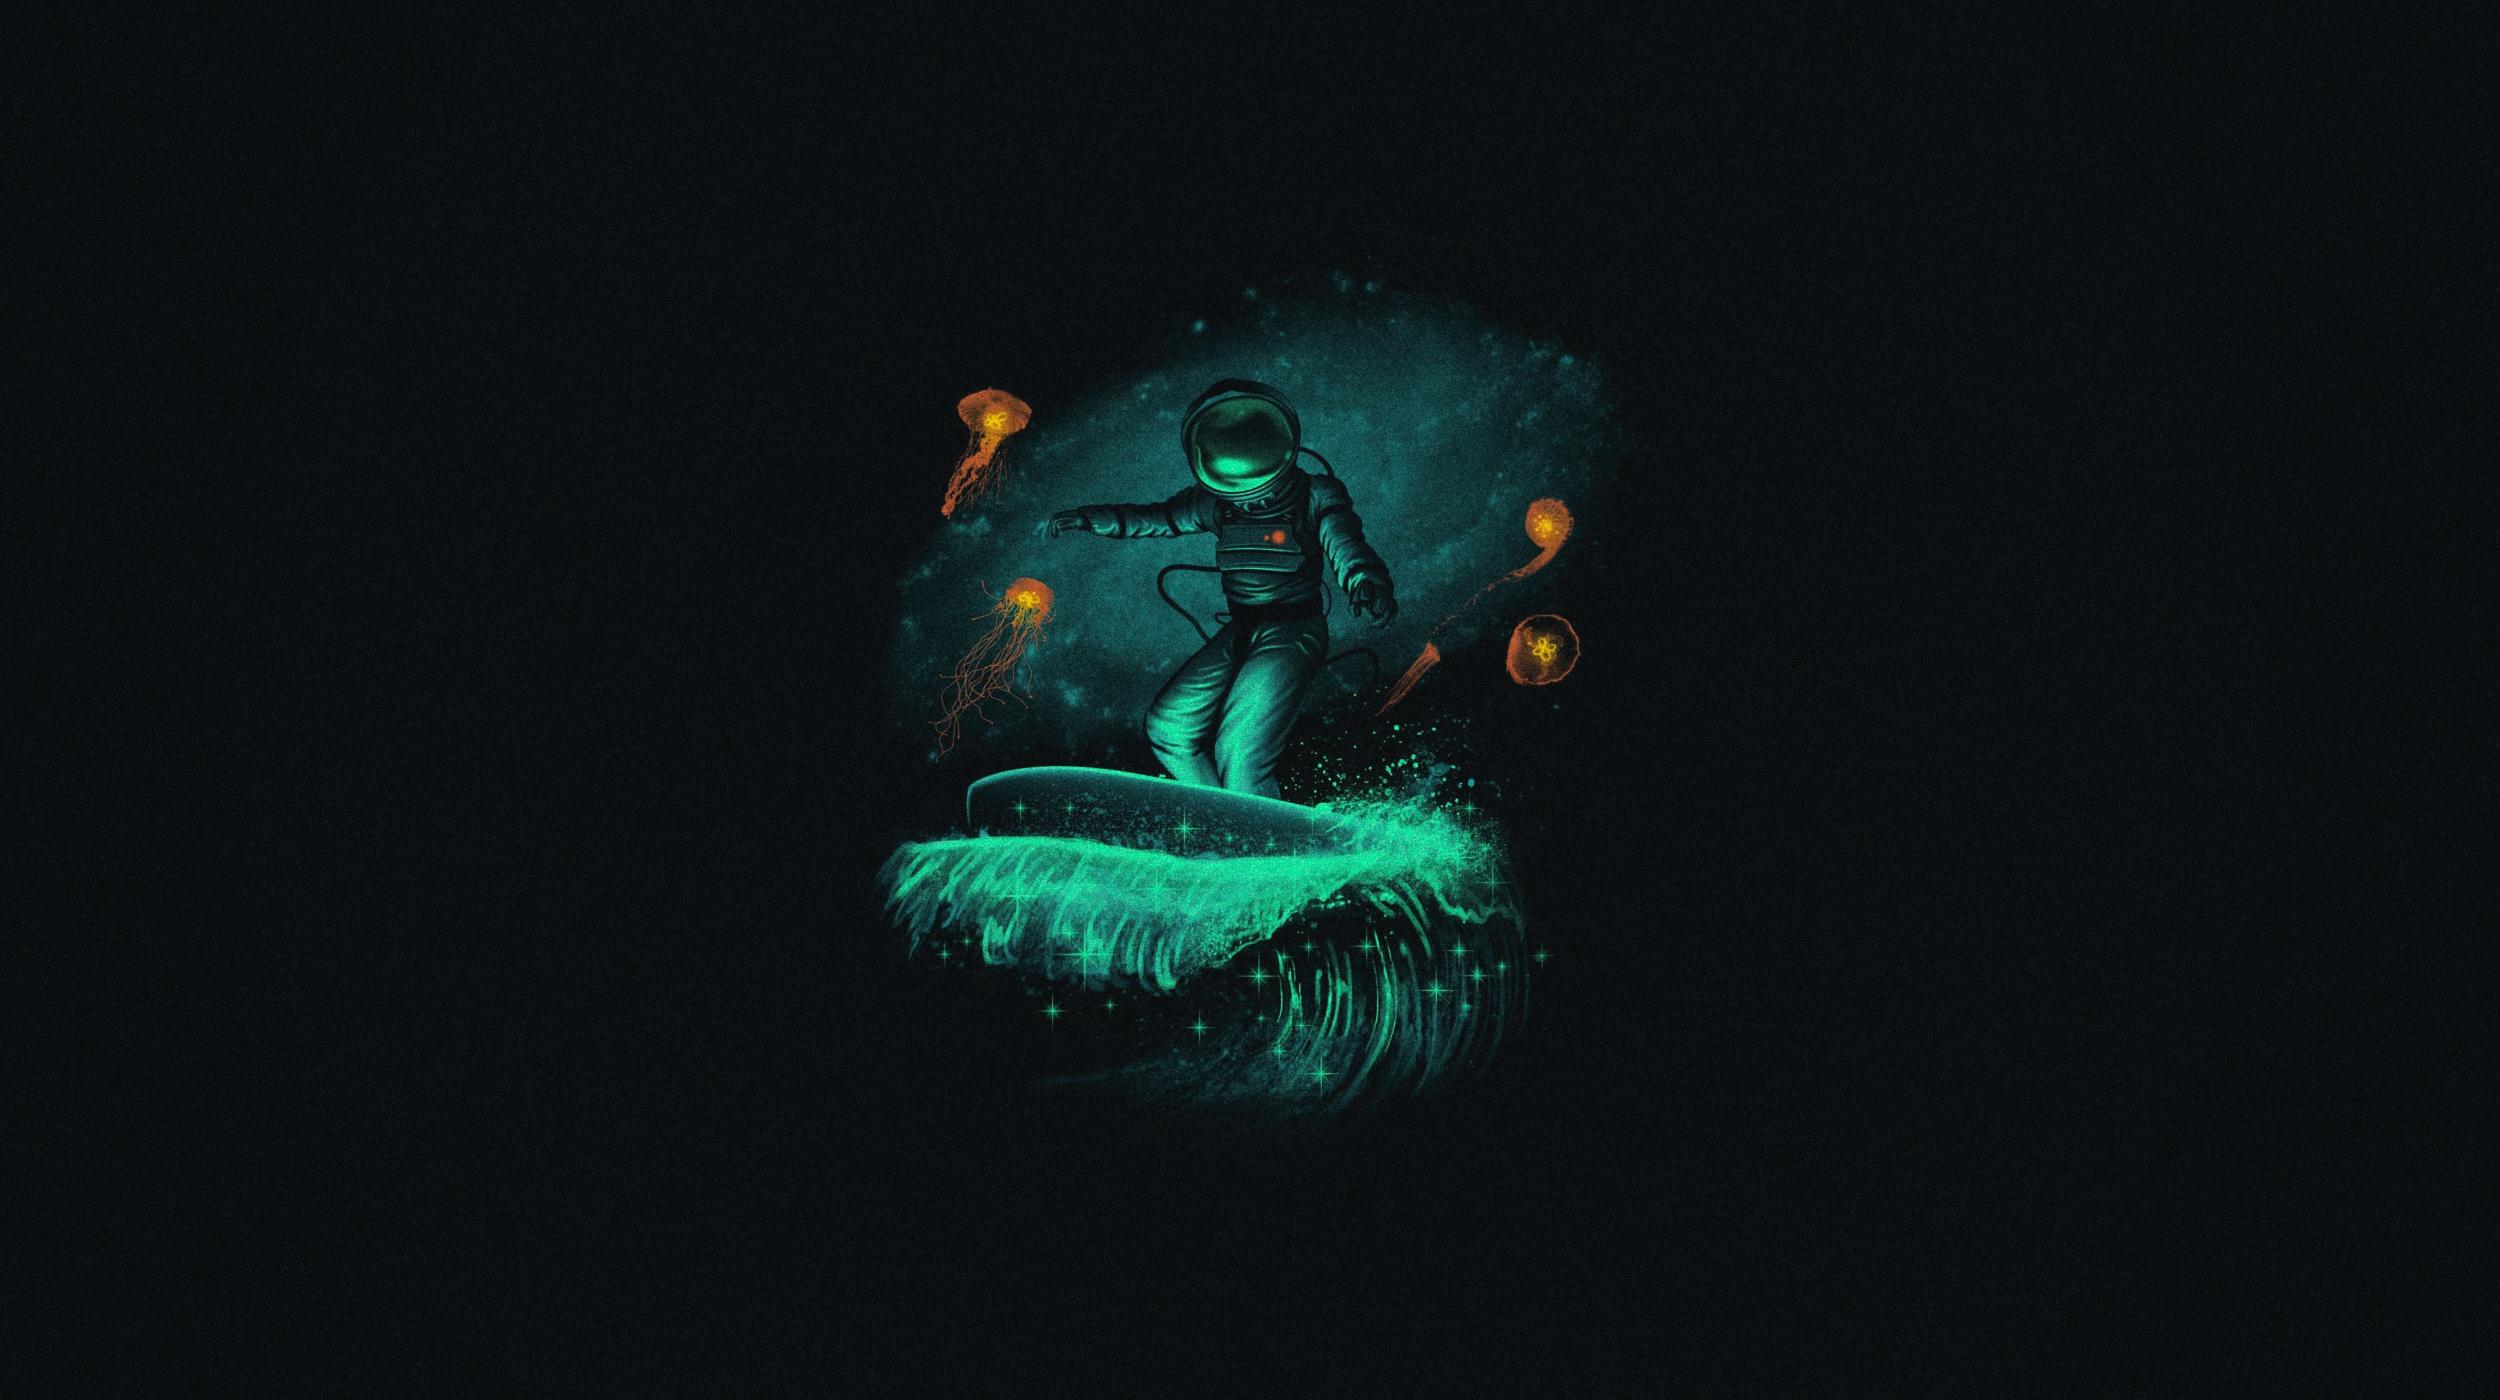 Astronaut Dark Minimalism Art Hd Artist 4k Wallpapers